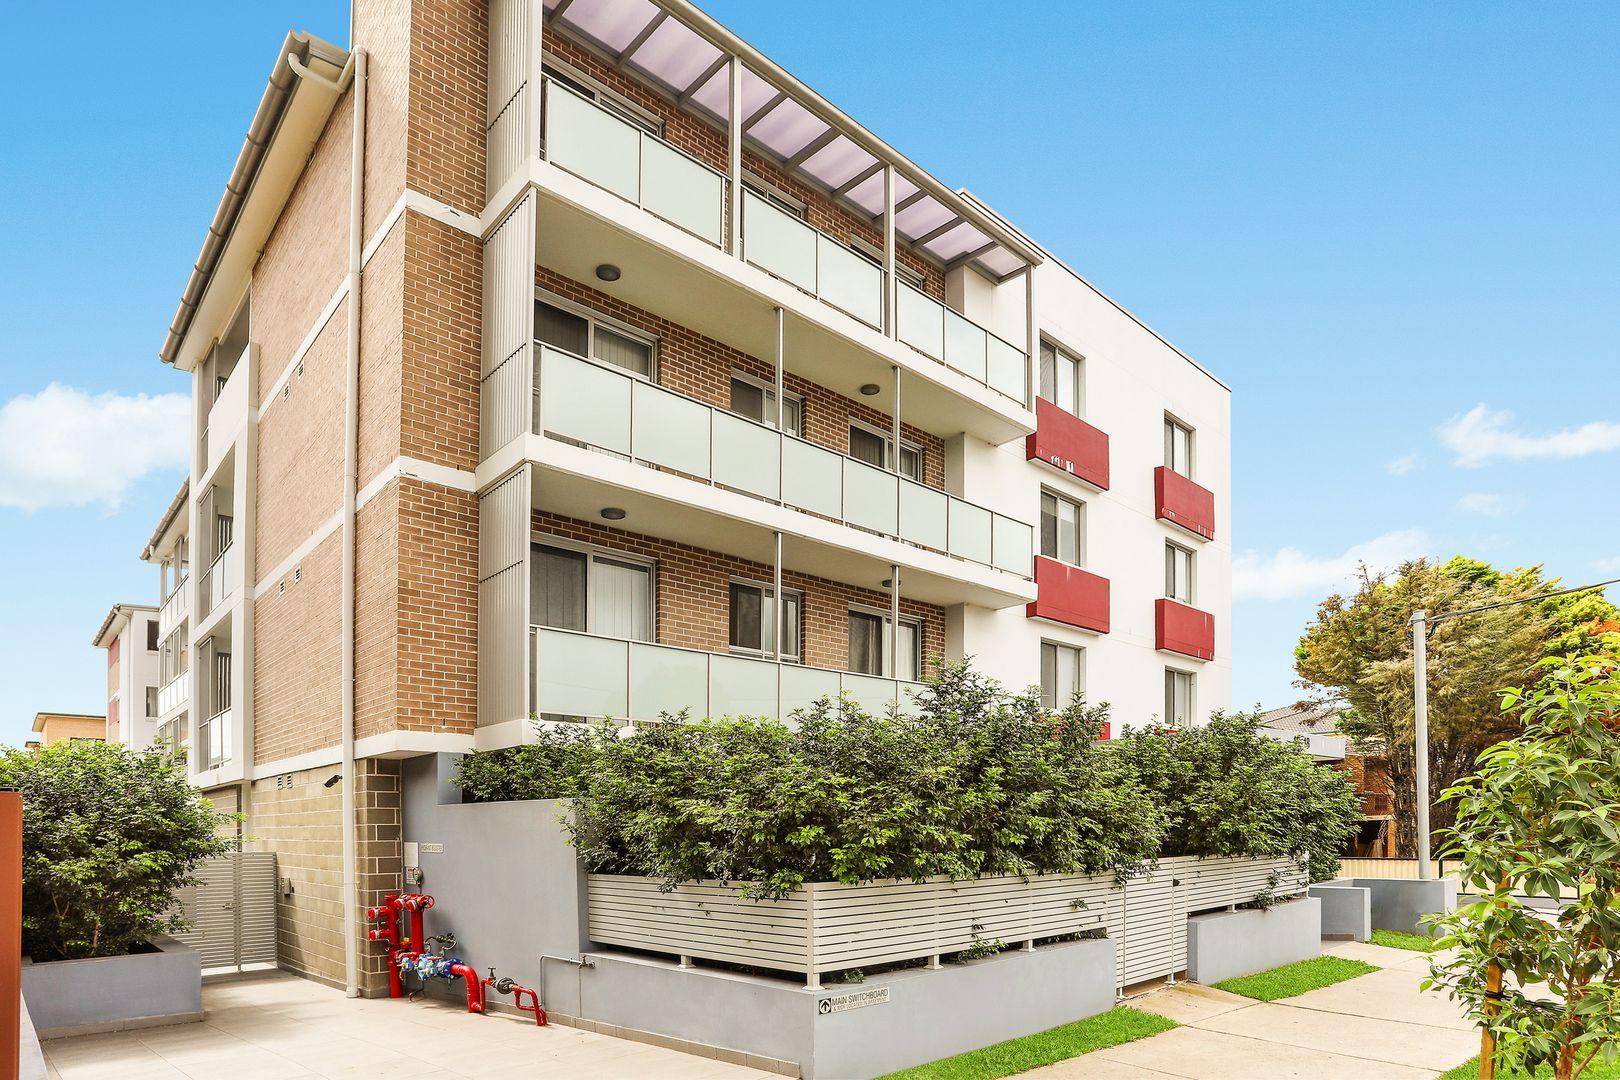 23/16-18 Mary Street, Lidcombe NSW 2141, Image 0